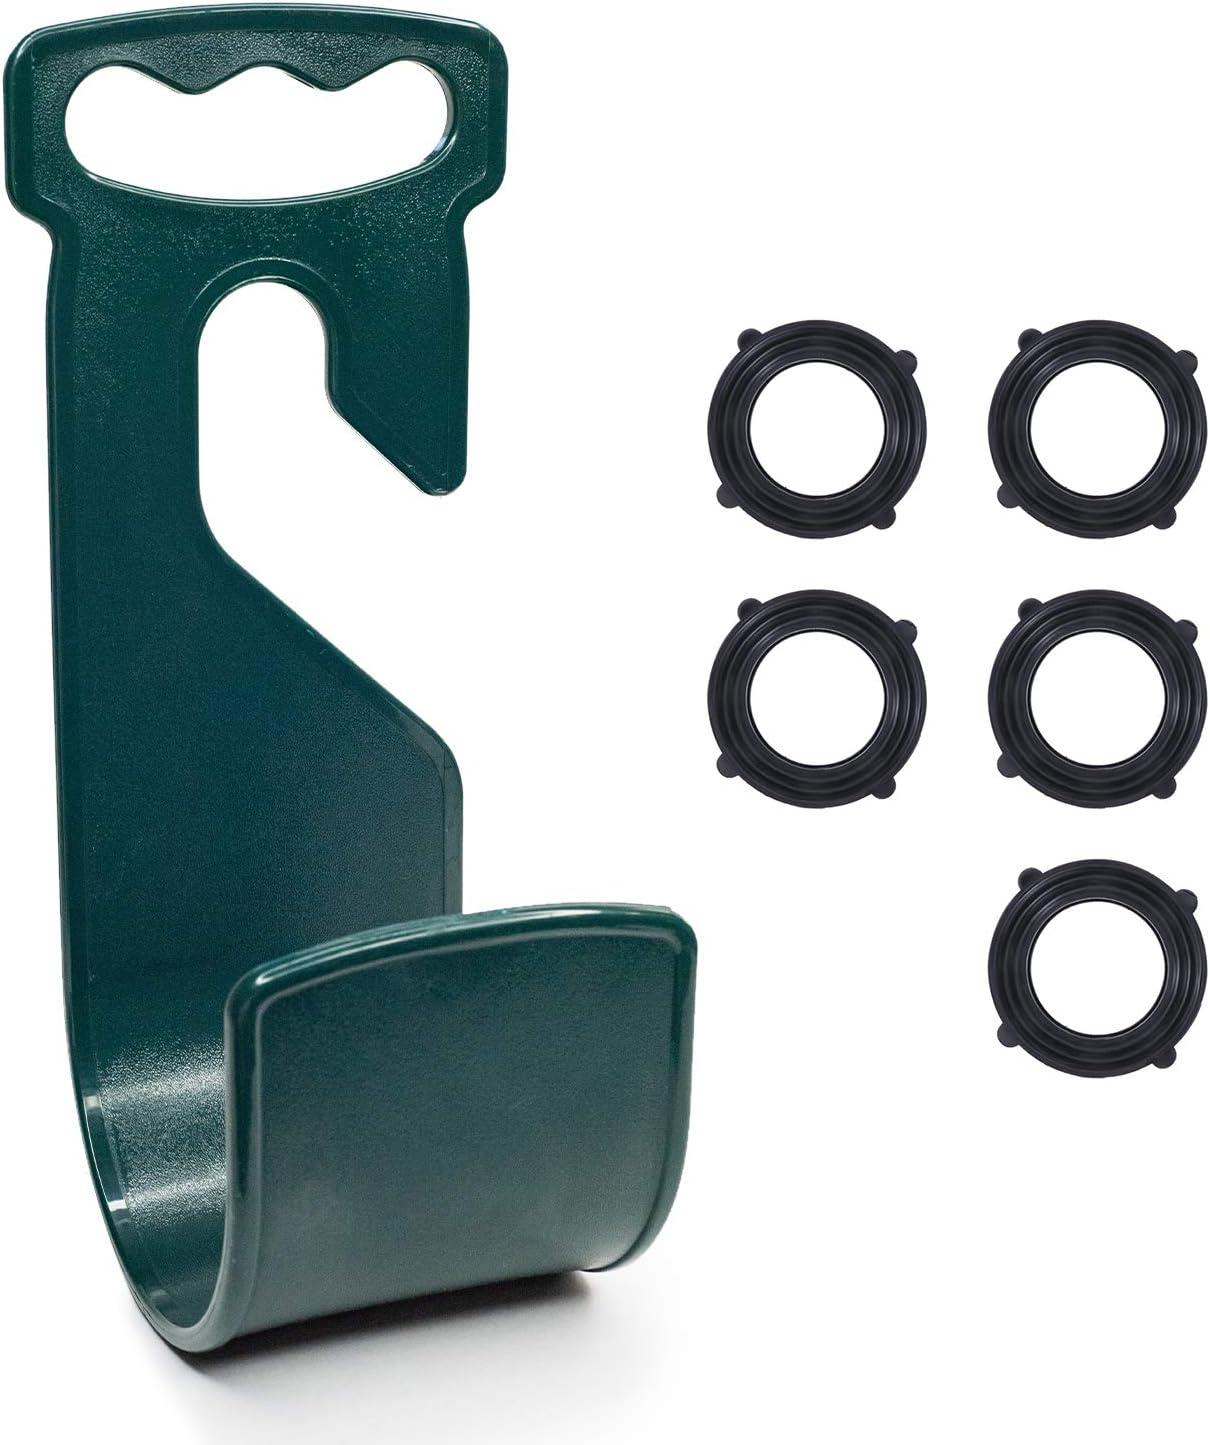 Jork Products Garden Hose Hanger, Plastic, Dark Green, Includes 5 Garden Hose Washers